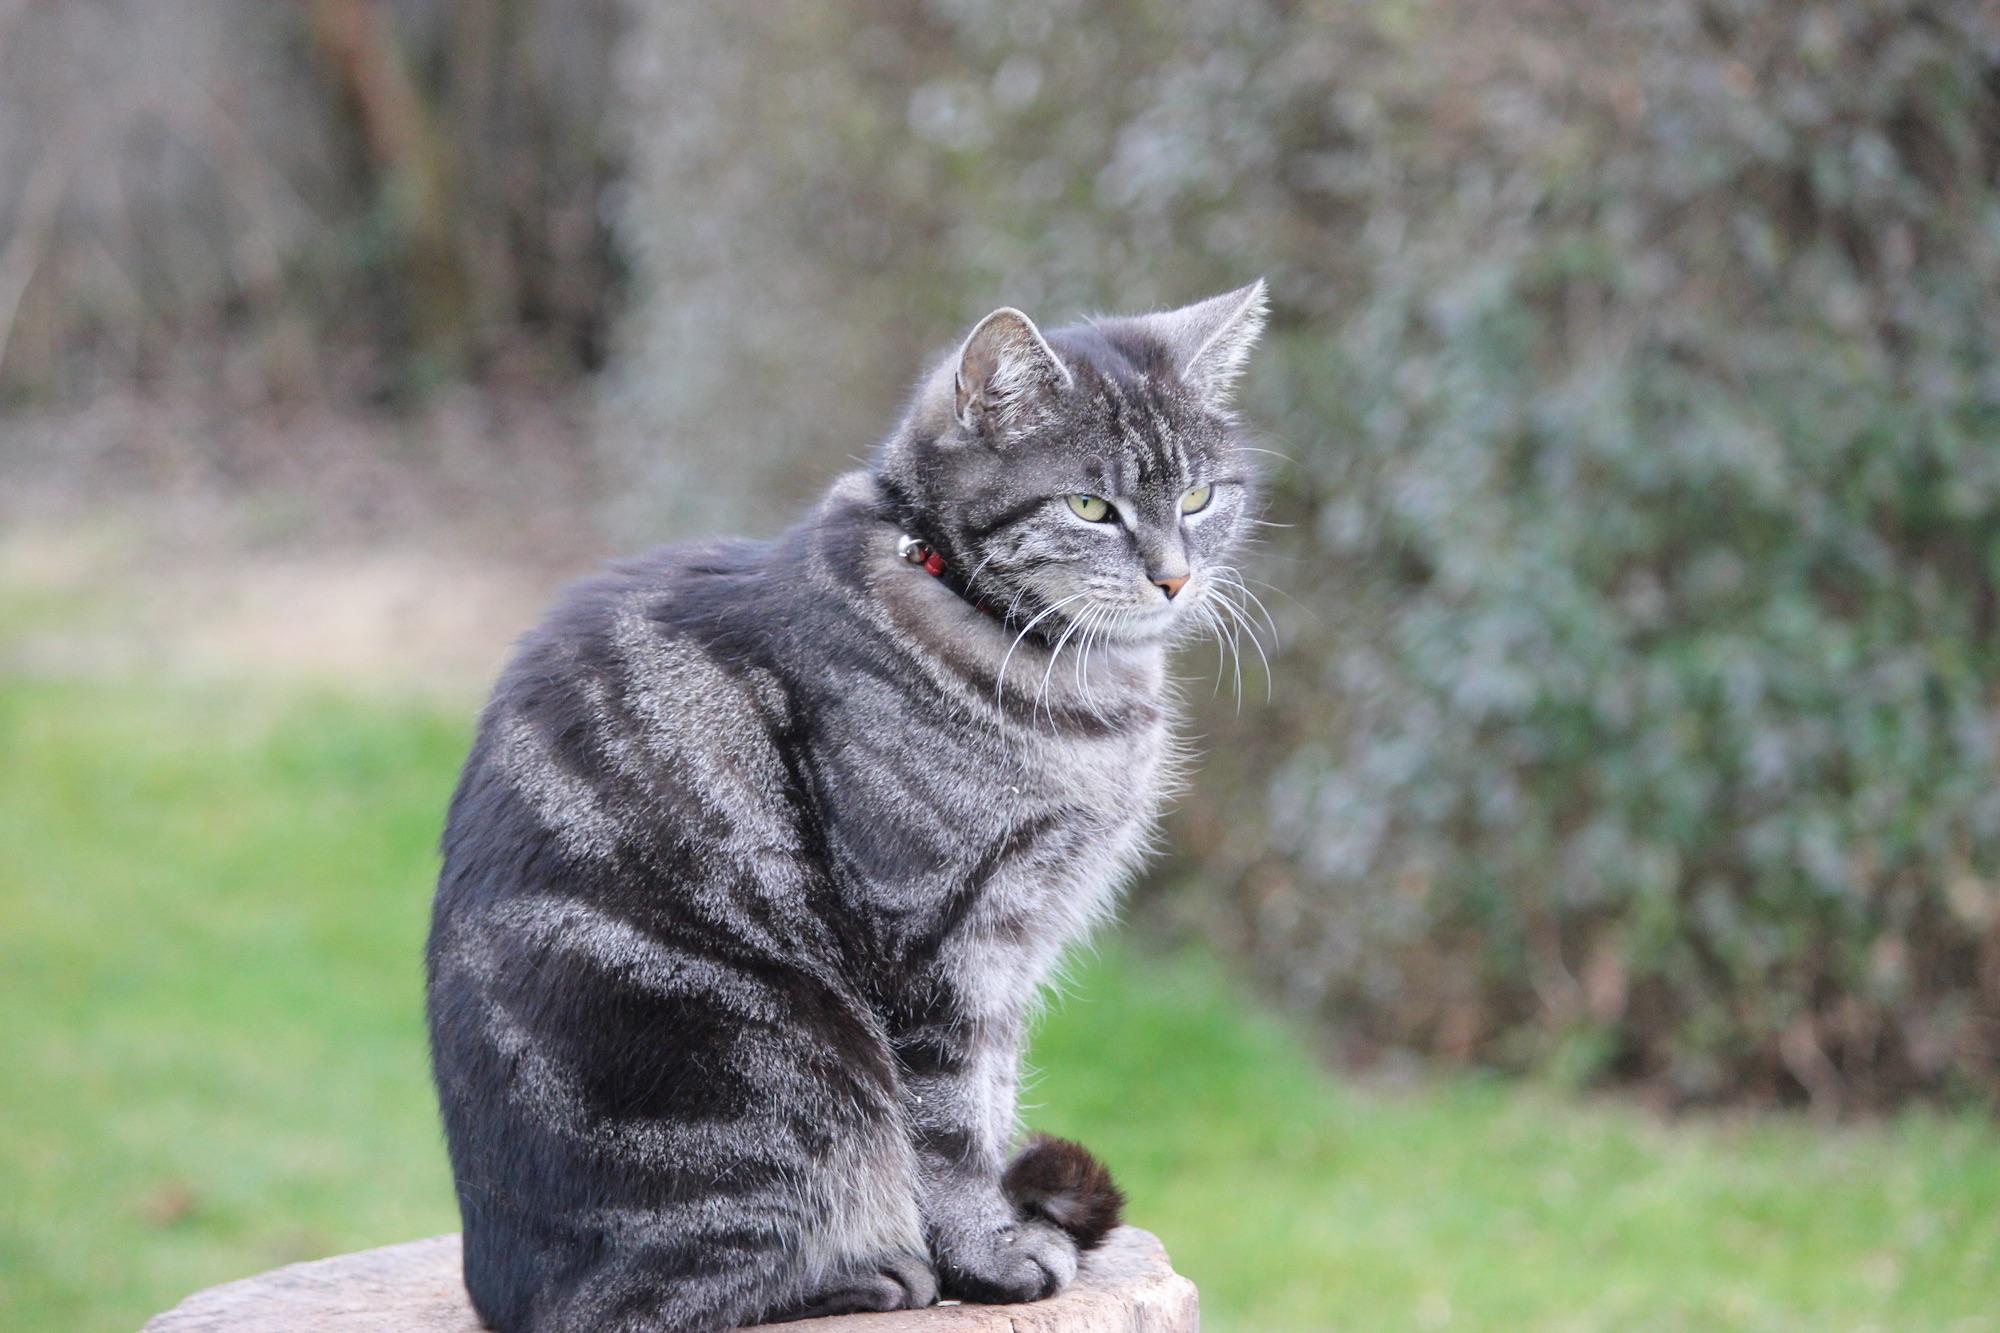 Free fauna whiskers vertebrate british shorthair